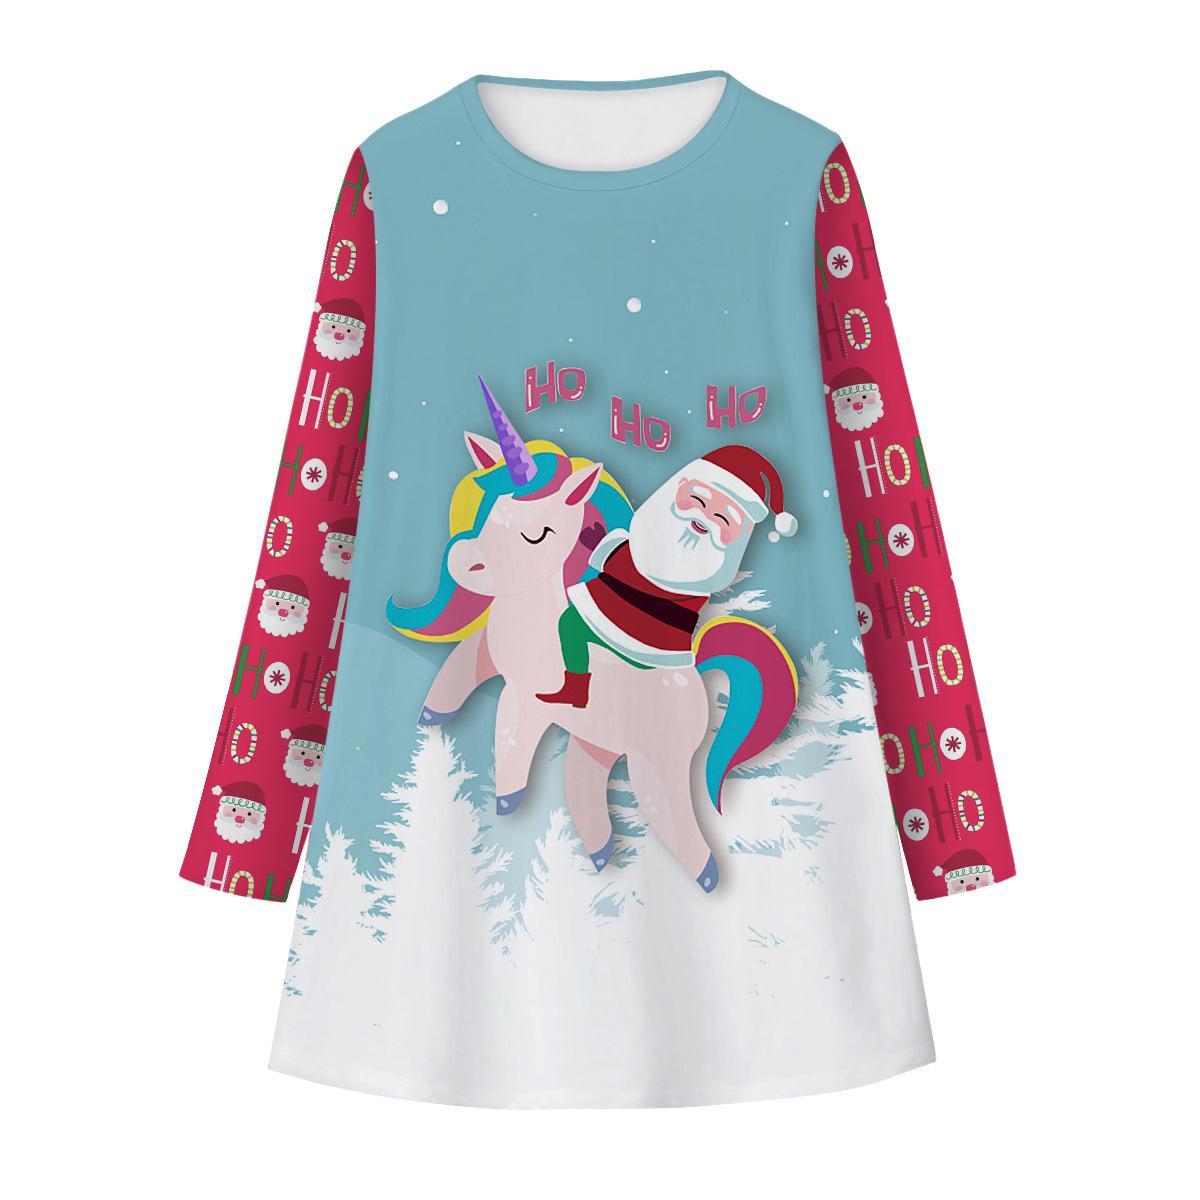 New Christmas Space Unicorn Digital Print Girls' Dress Fashionable Long Sleeve Children's Dress Autumn Winter Dress